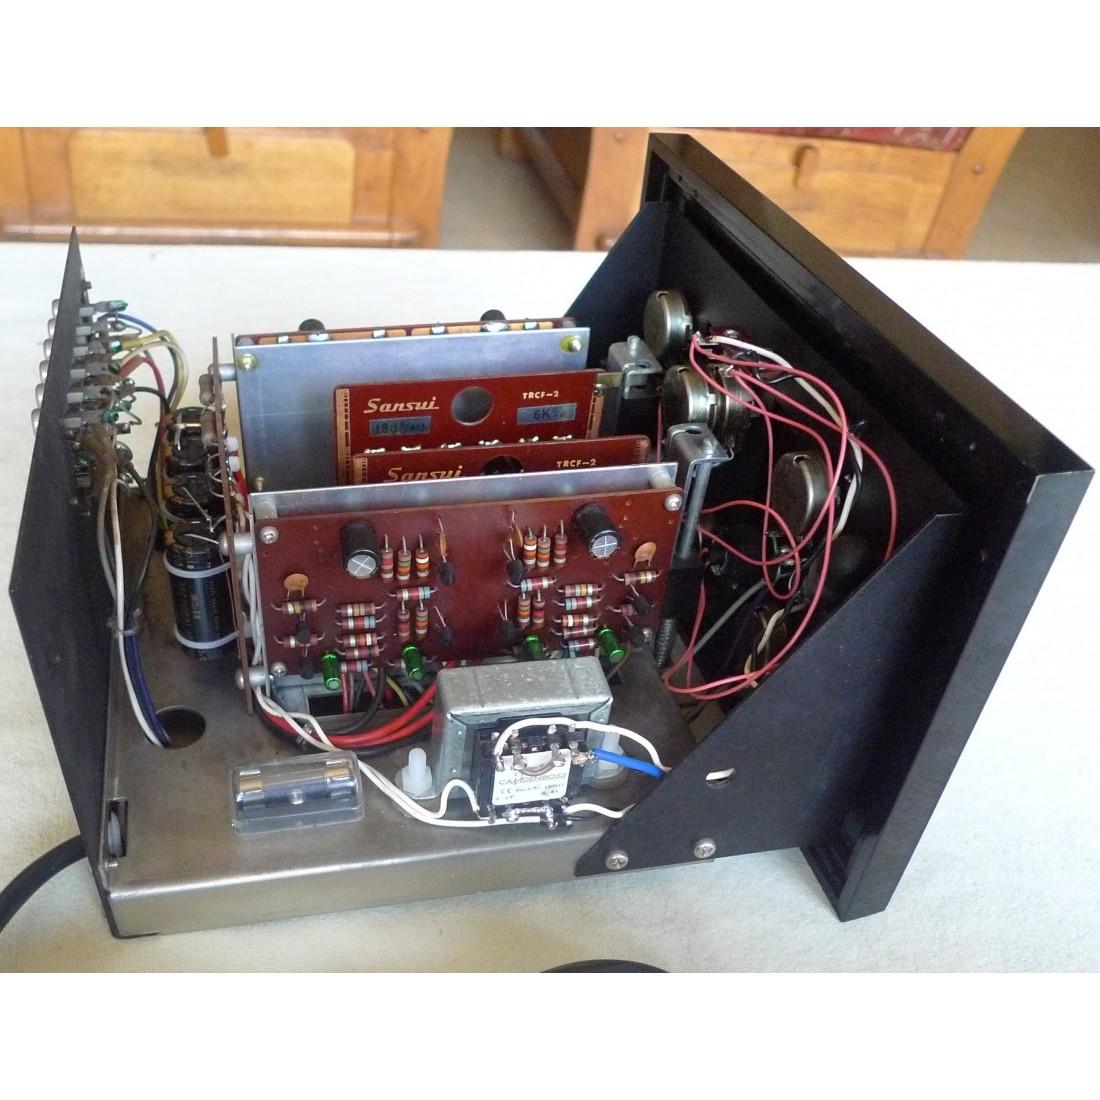 filtre actif 3 voies vintage sansui cd 3 analogique hi fi cartes. Black Bedroom Furniture Sets. Home Design Ideas